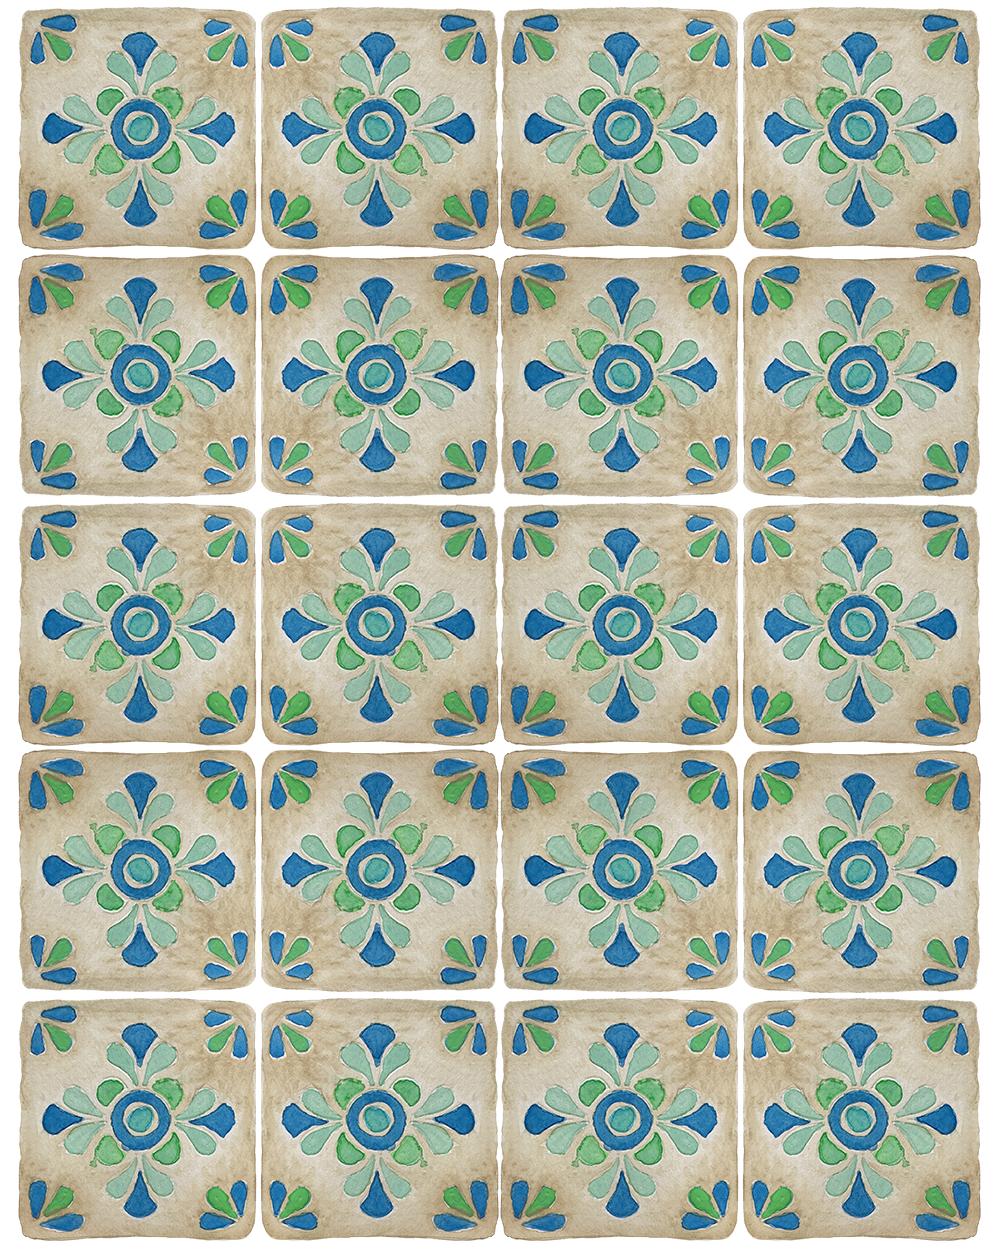 mexica-watercolor-tiles-pattern-01.jpg